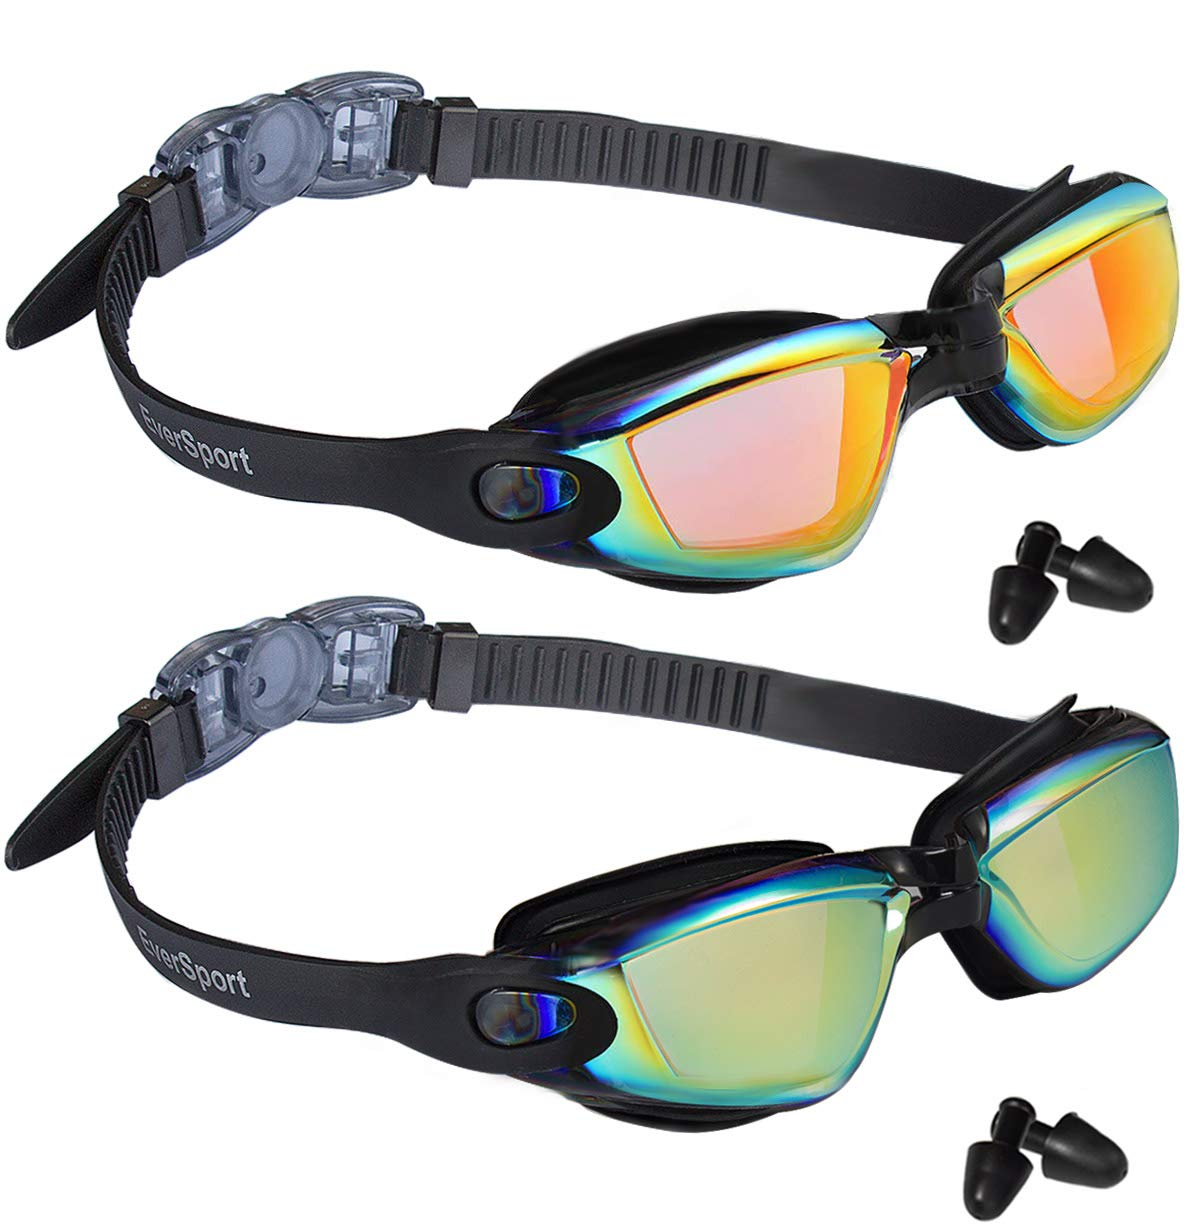 EverSport Swim Goggles Pack of 2 Swimming Goggles Anti Fog